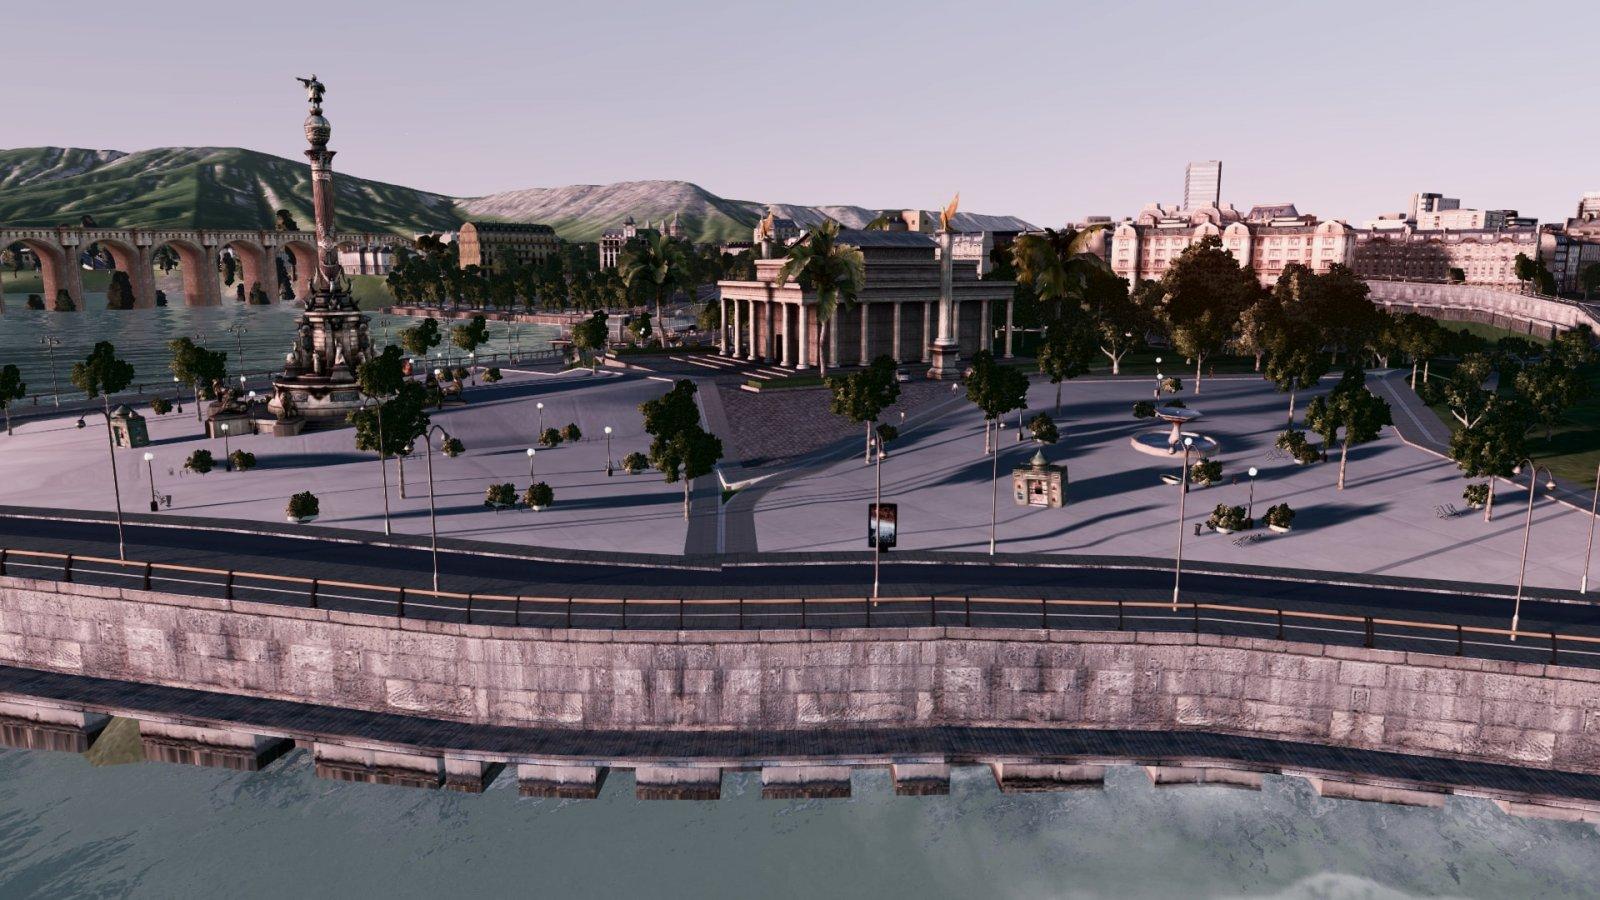 02_06_Artemis Temple.jpg